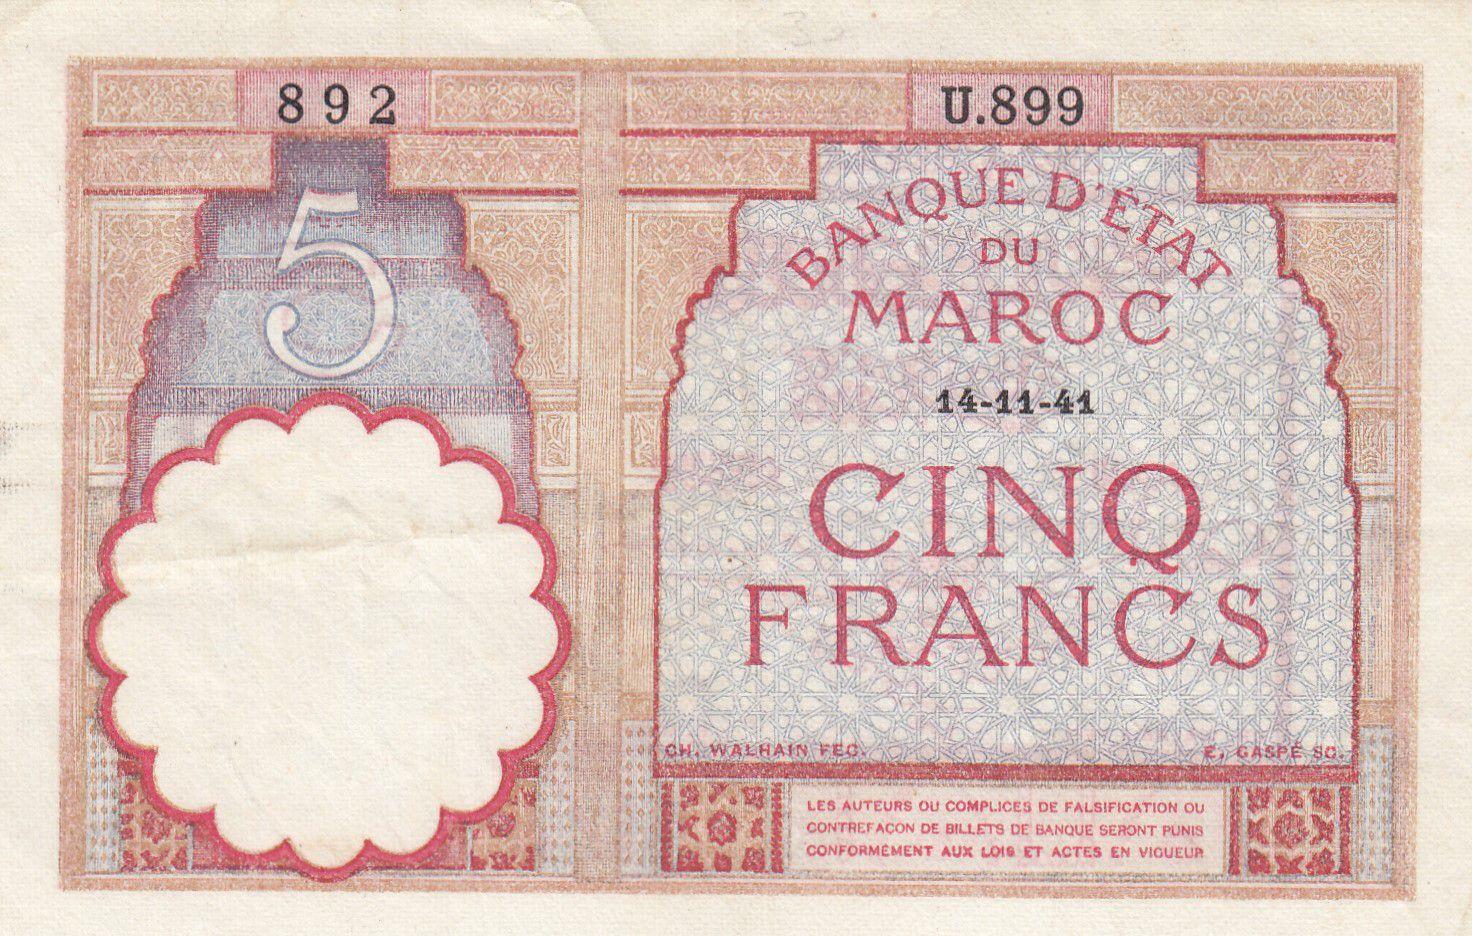 Maroc 5 Francs 14-11-1941 - TTB - Série U.899 - P.23Ab